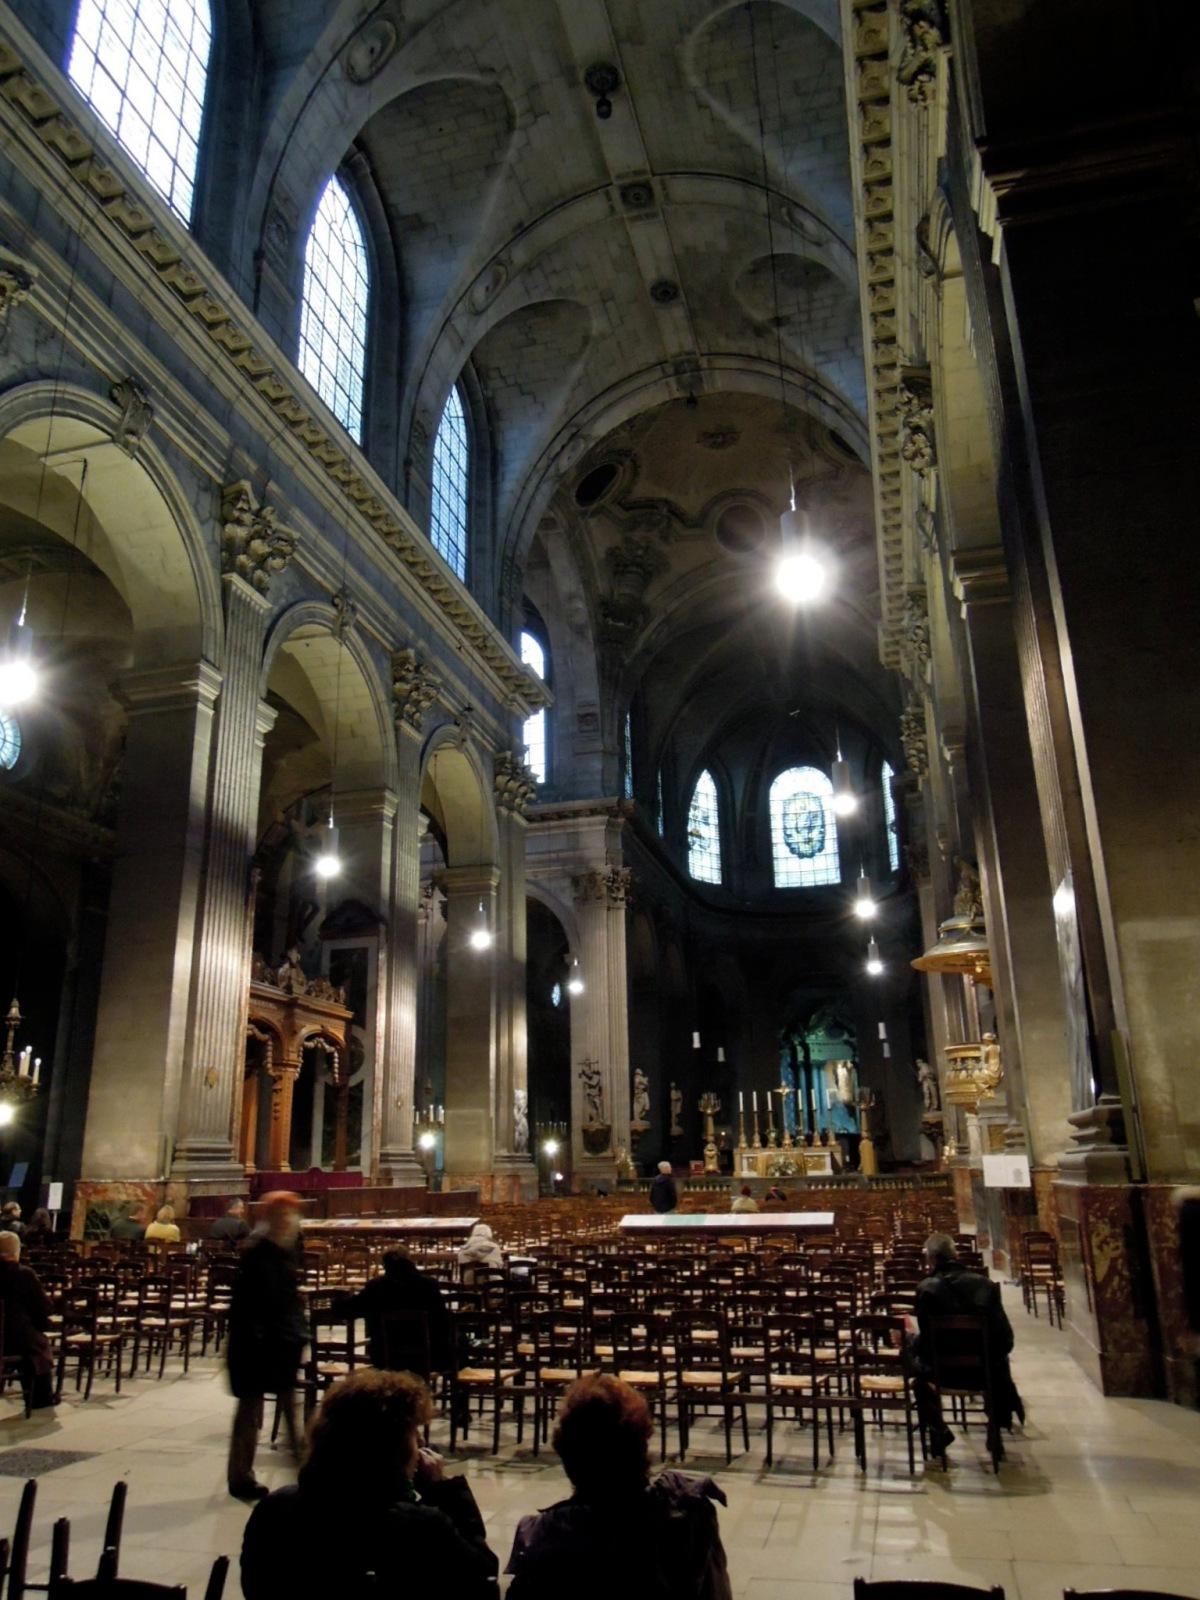 Inside Saint-Sulpice